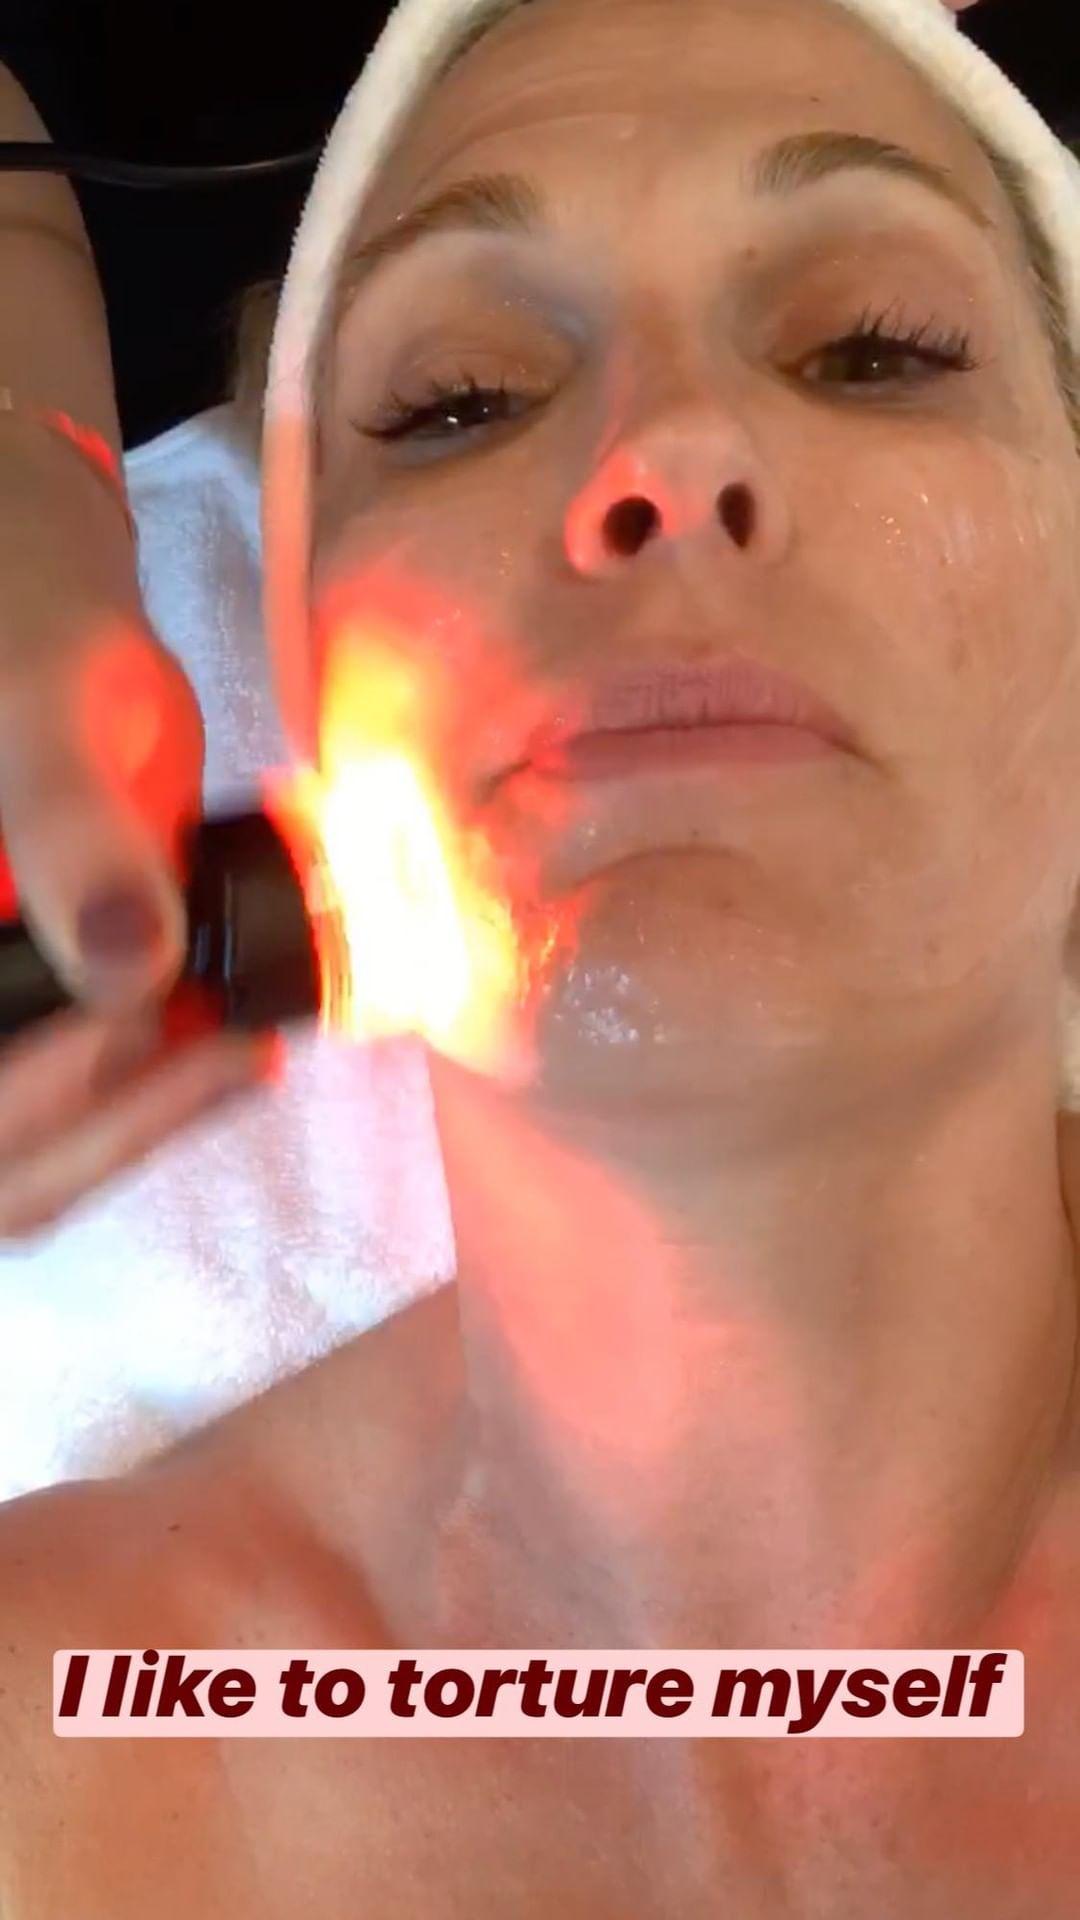 mollybsims Молли Симс на процедуре светодиодной подтяжки лица